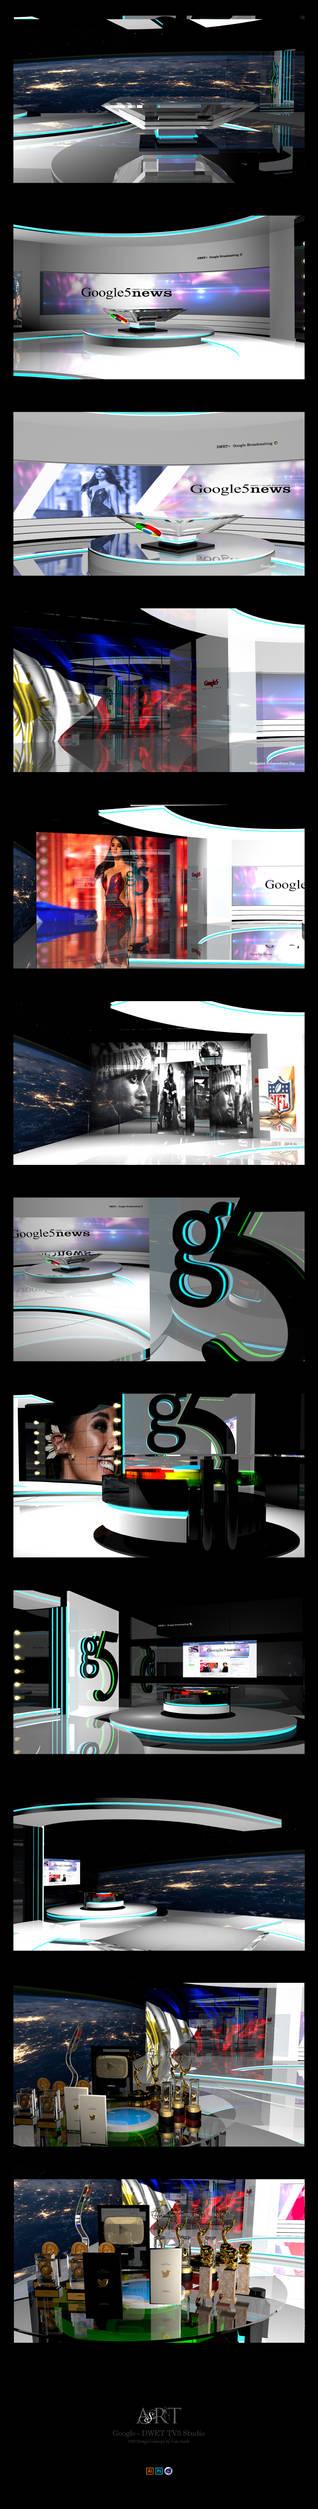 google TV5